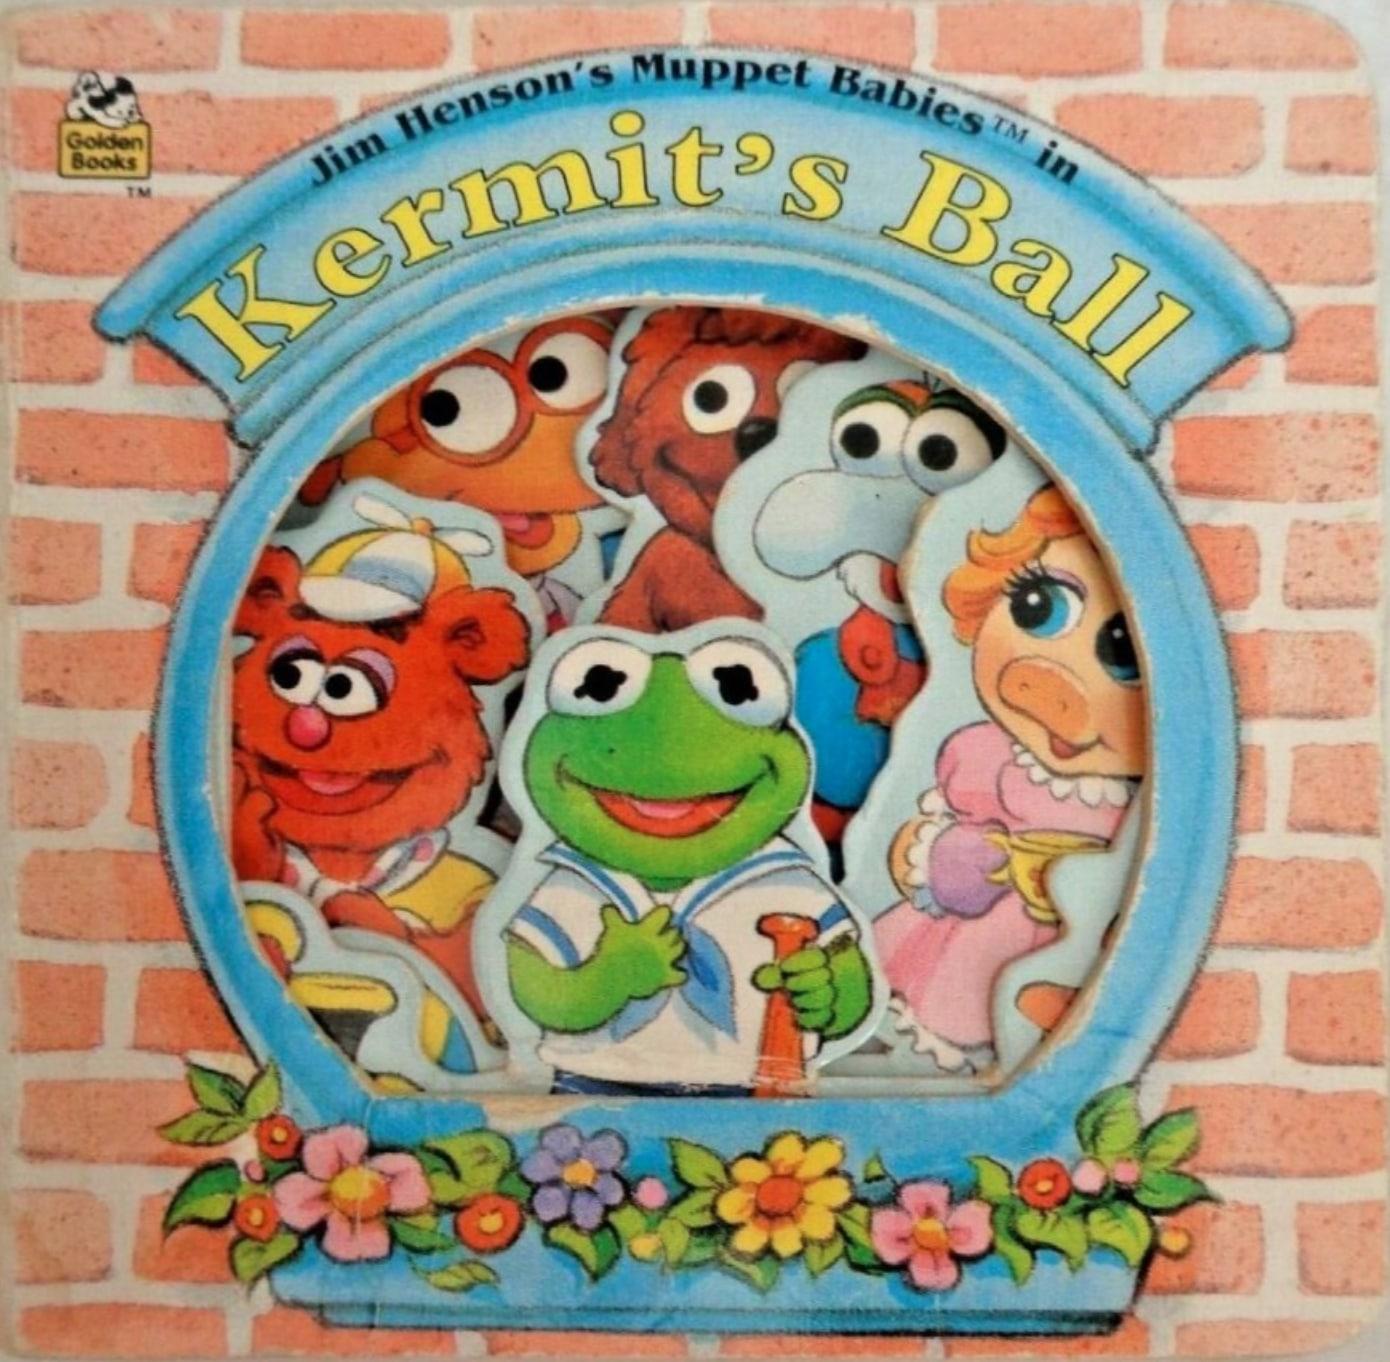 Kermit's ball book